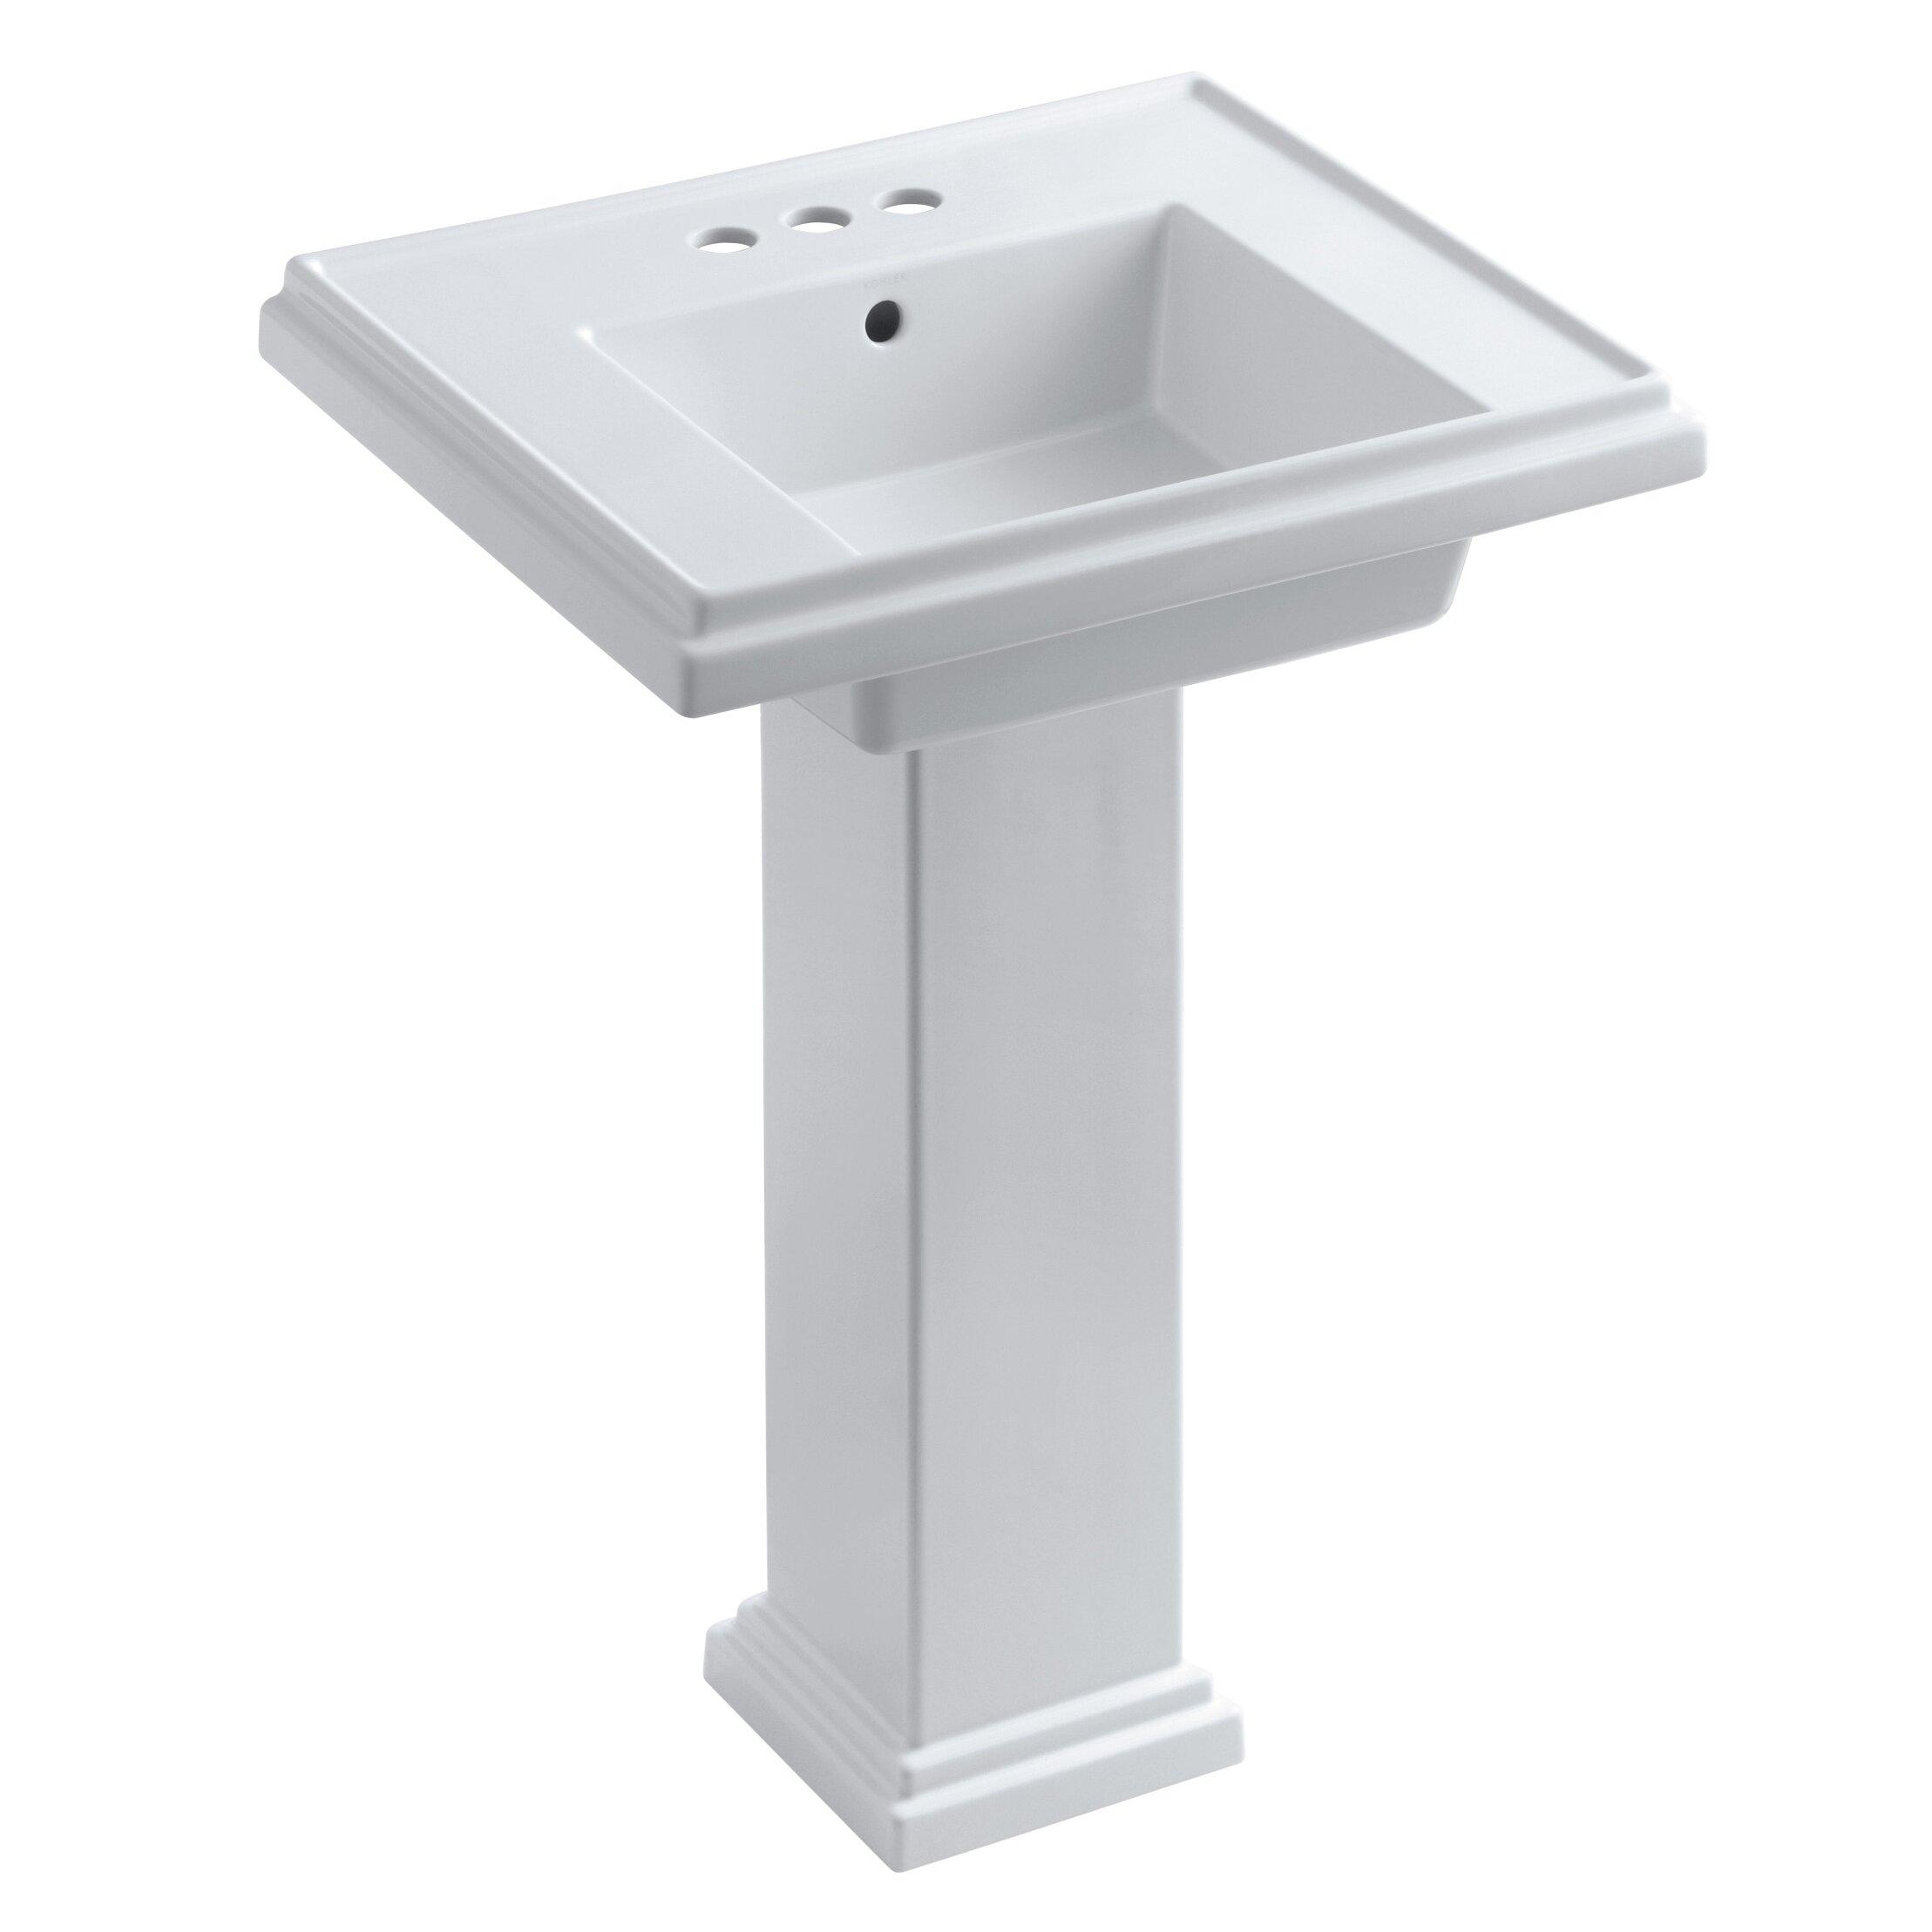 Tresham Pedestal Sink : Kohler Tresham 24